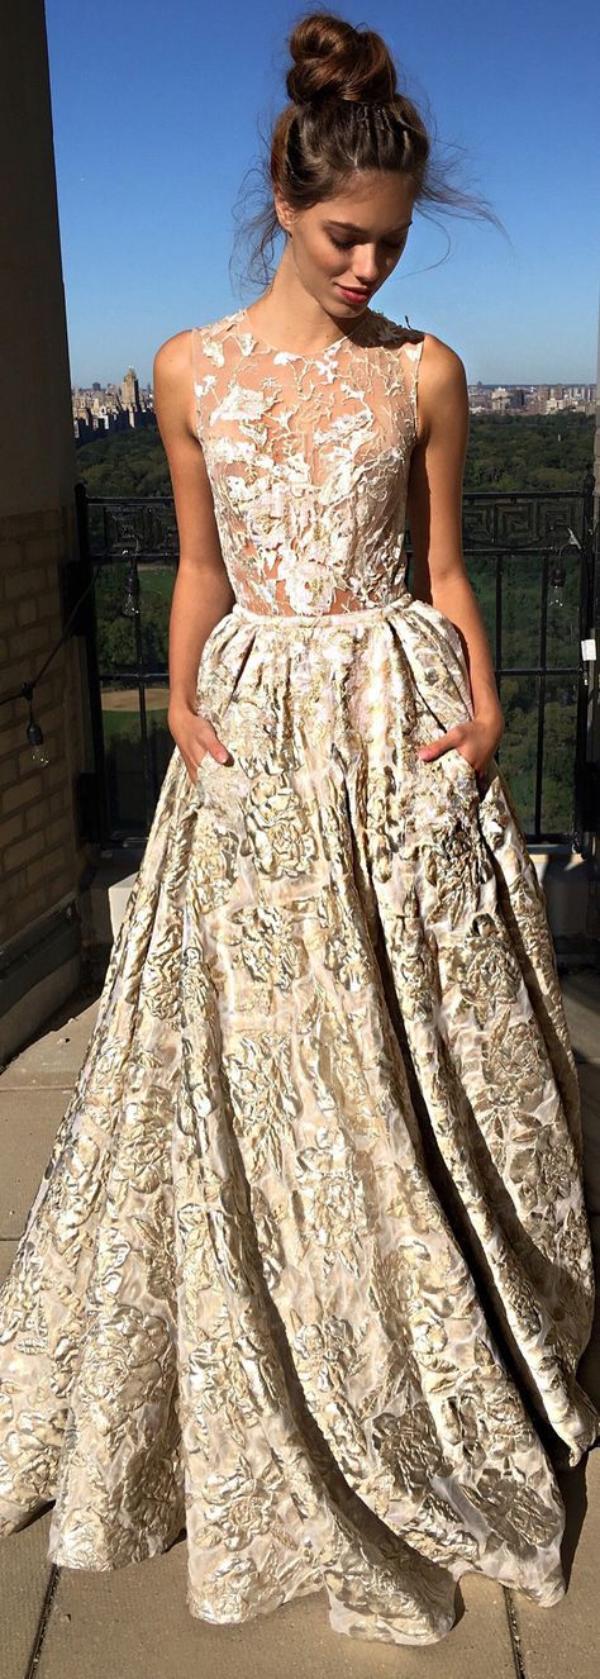 Kenali 9 Tren Bahan Gaun Pernikahan Ini - Womantalk